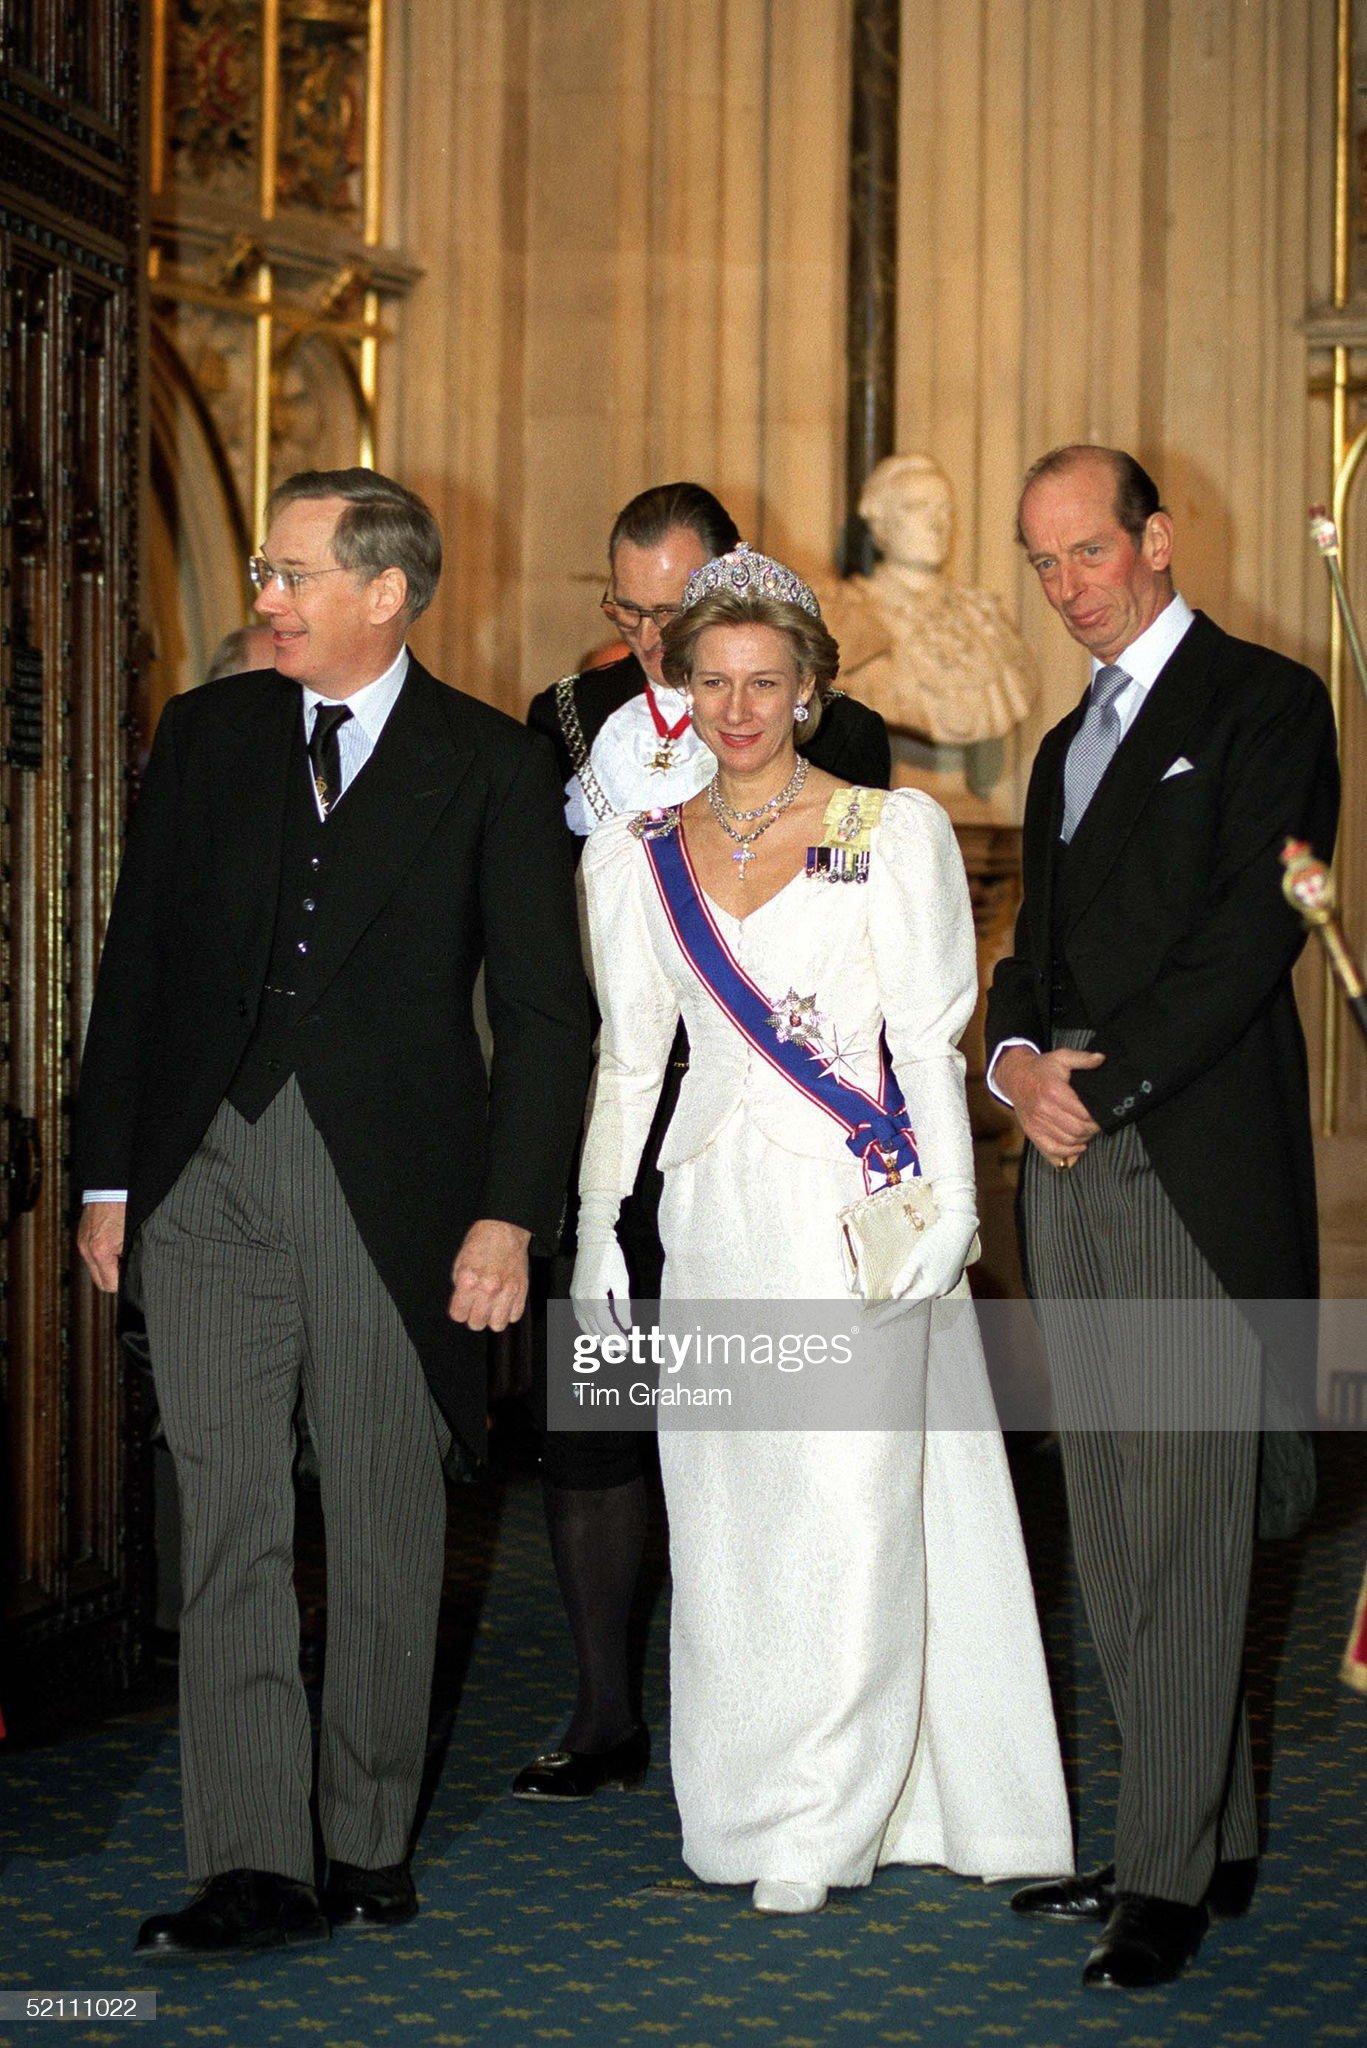 Duke And Duchess Gloucester And Duke Of Kent : News Photo